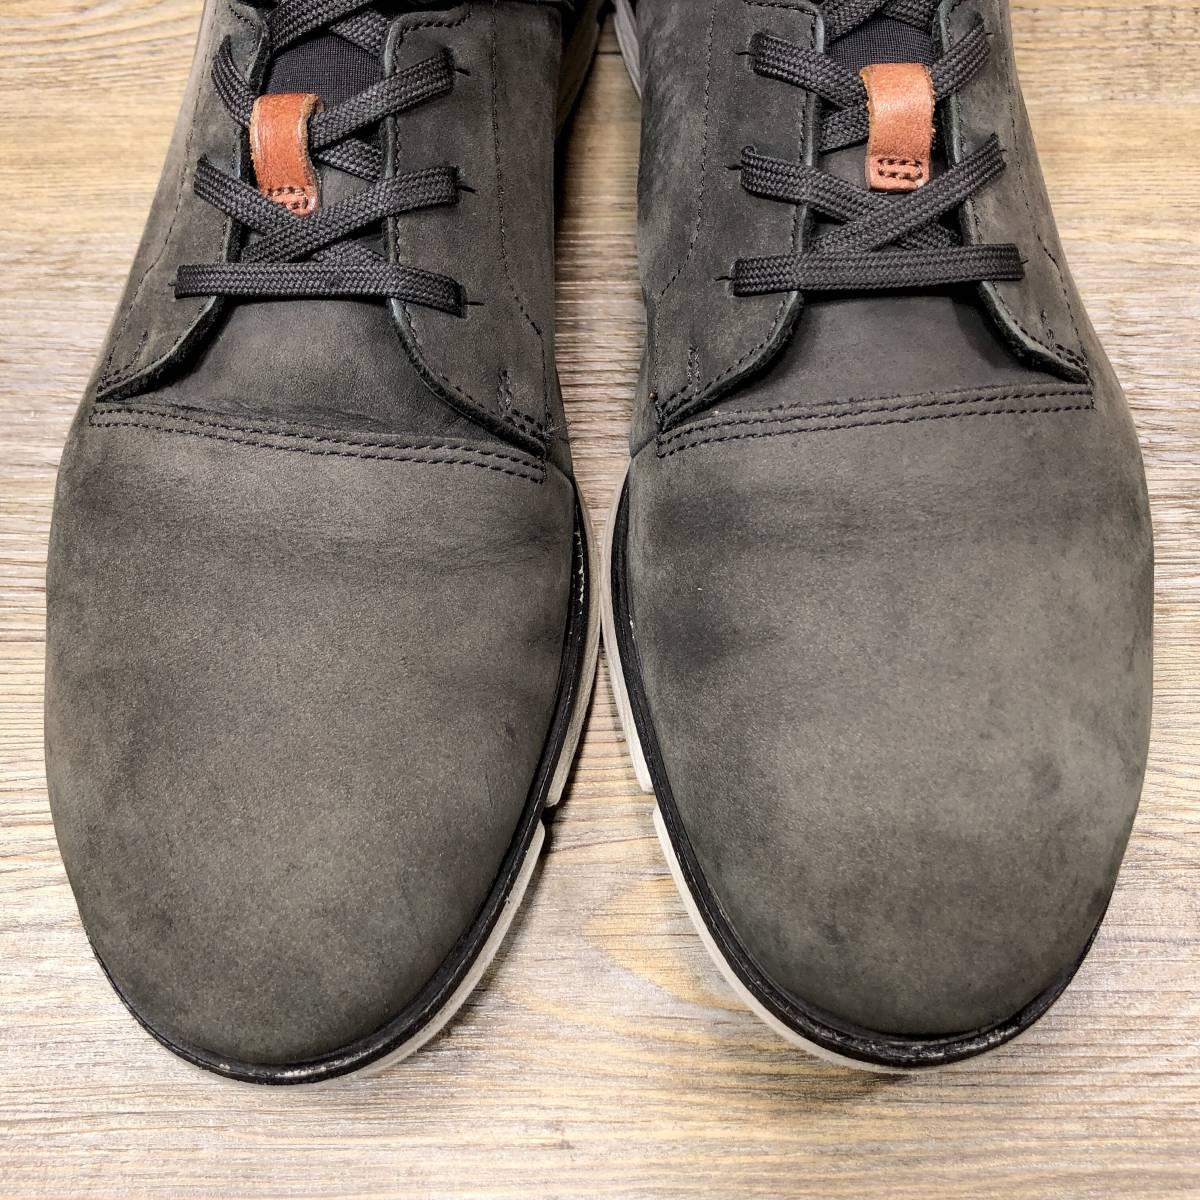 ■Clarks■ 25cm UK6.5 グレー クラークス レザースニーカー メンズ 靴 革靴 天然皮革 箱付き くつ 中古 宅急便 即決_画像4